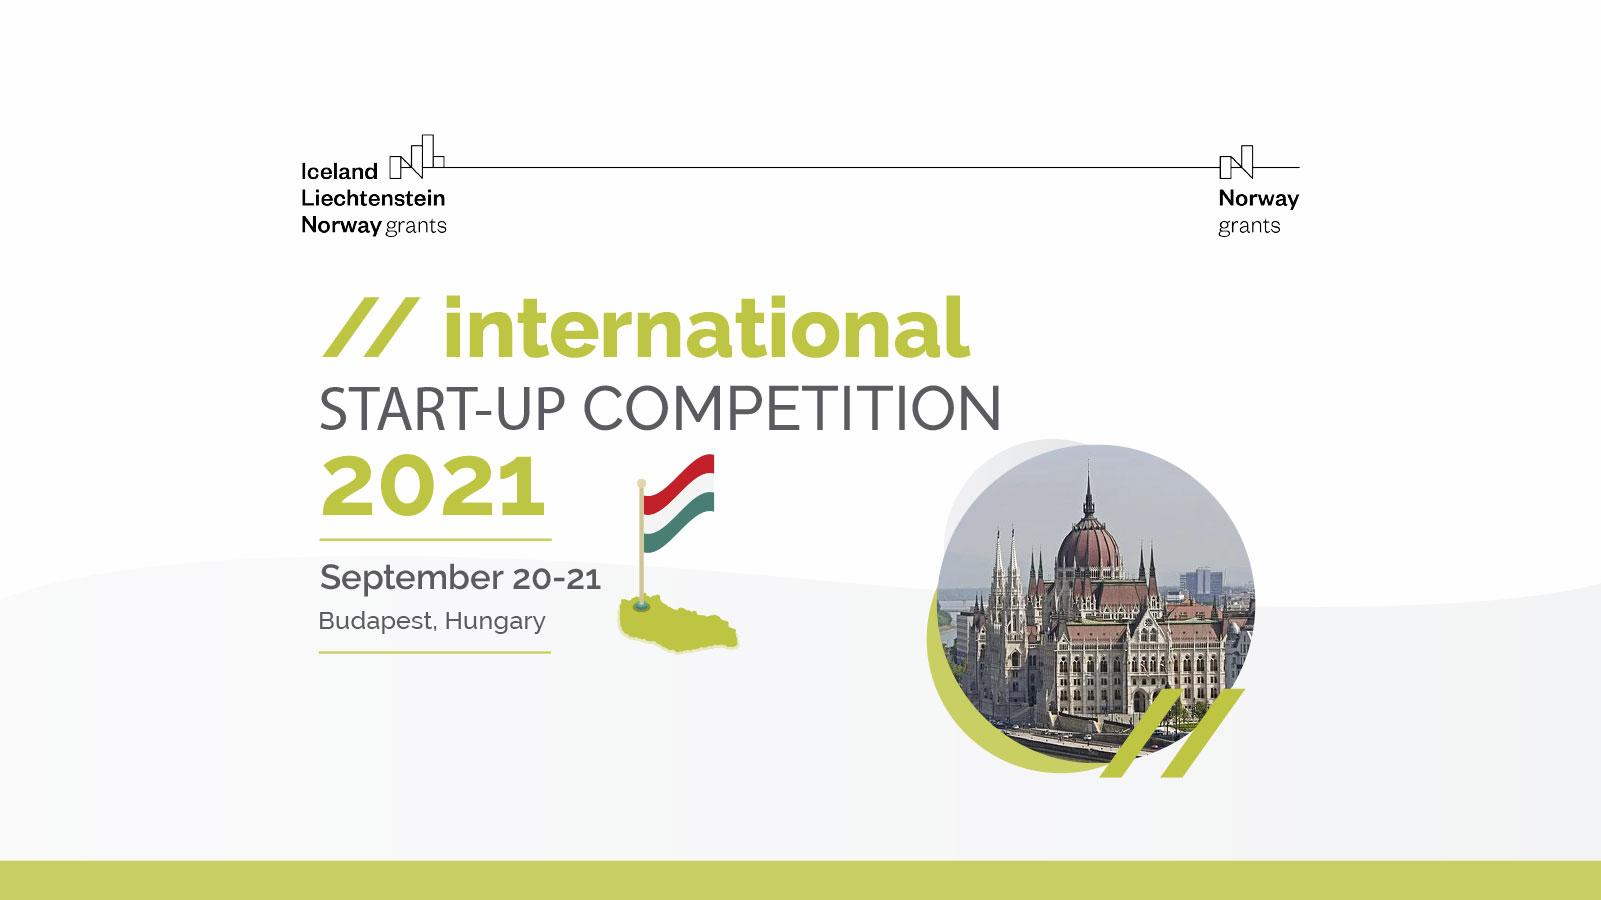 International start-up competition 2021 Budapest